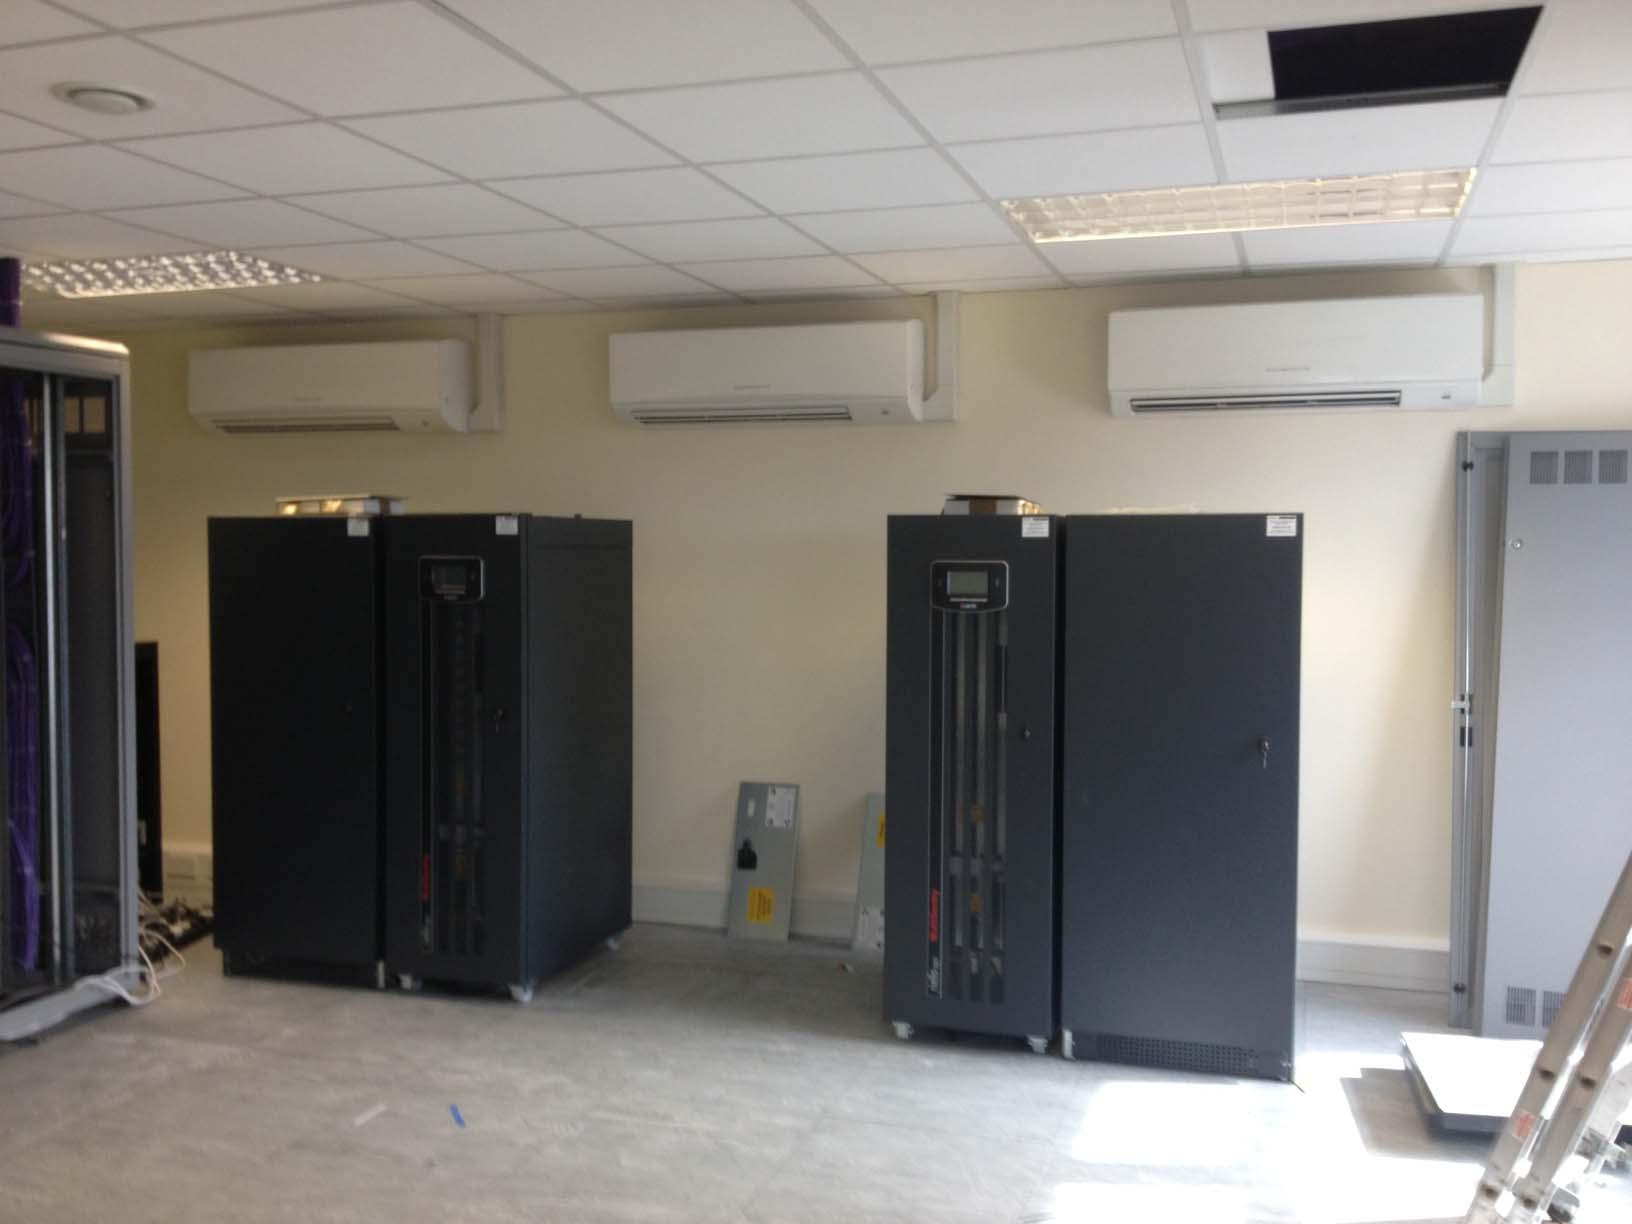 Server Room Air Conditioning At Saga Healthcare Plc